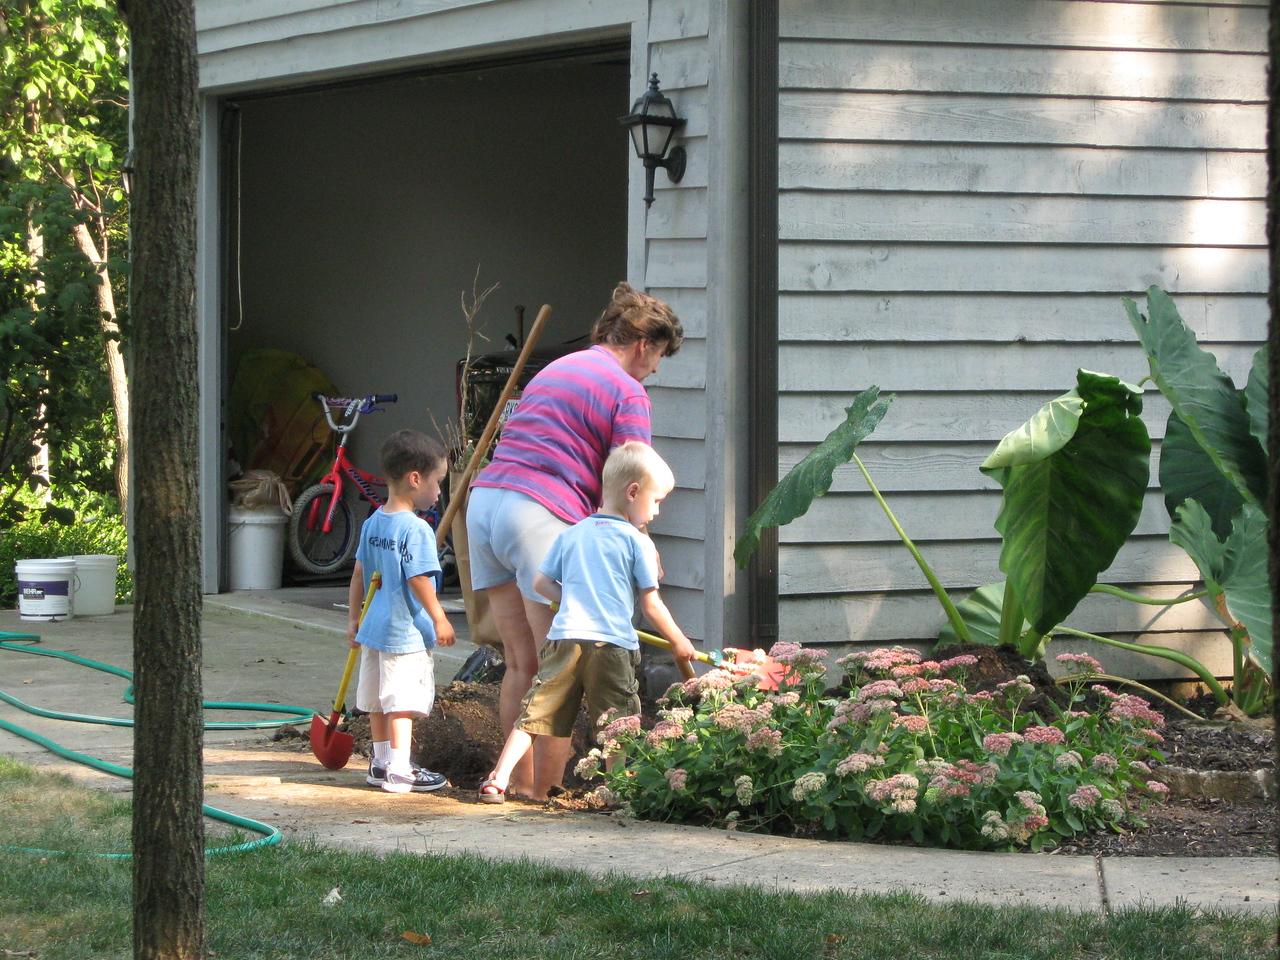 Kellen and Jackson helping Miss Juanita dig